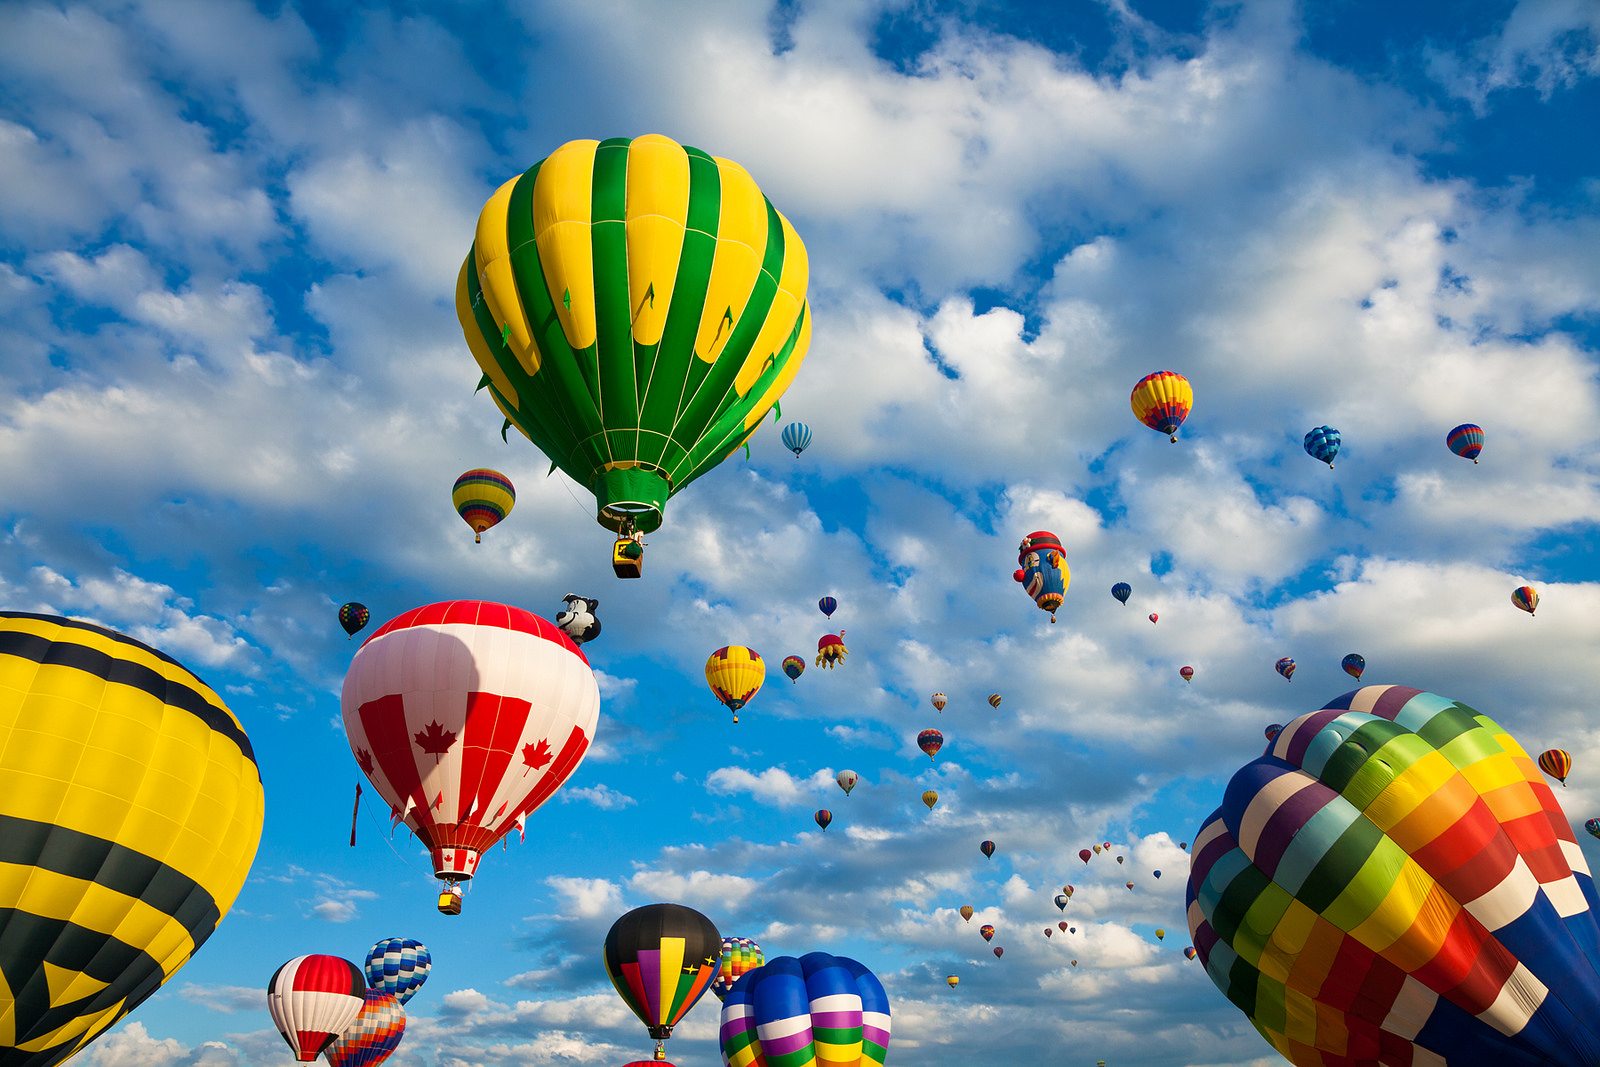 Vibrant balon udara panas diterbangkan, dari festival tahunan yang diselenggarakan di Saint-Jean-sur-Richelieu dekat Montreal, Quebec (Kanada). Flickr - Nicolas Raymond.